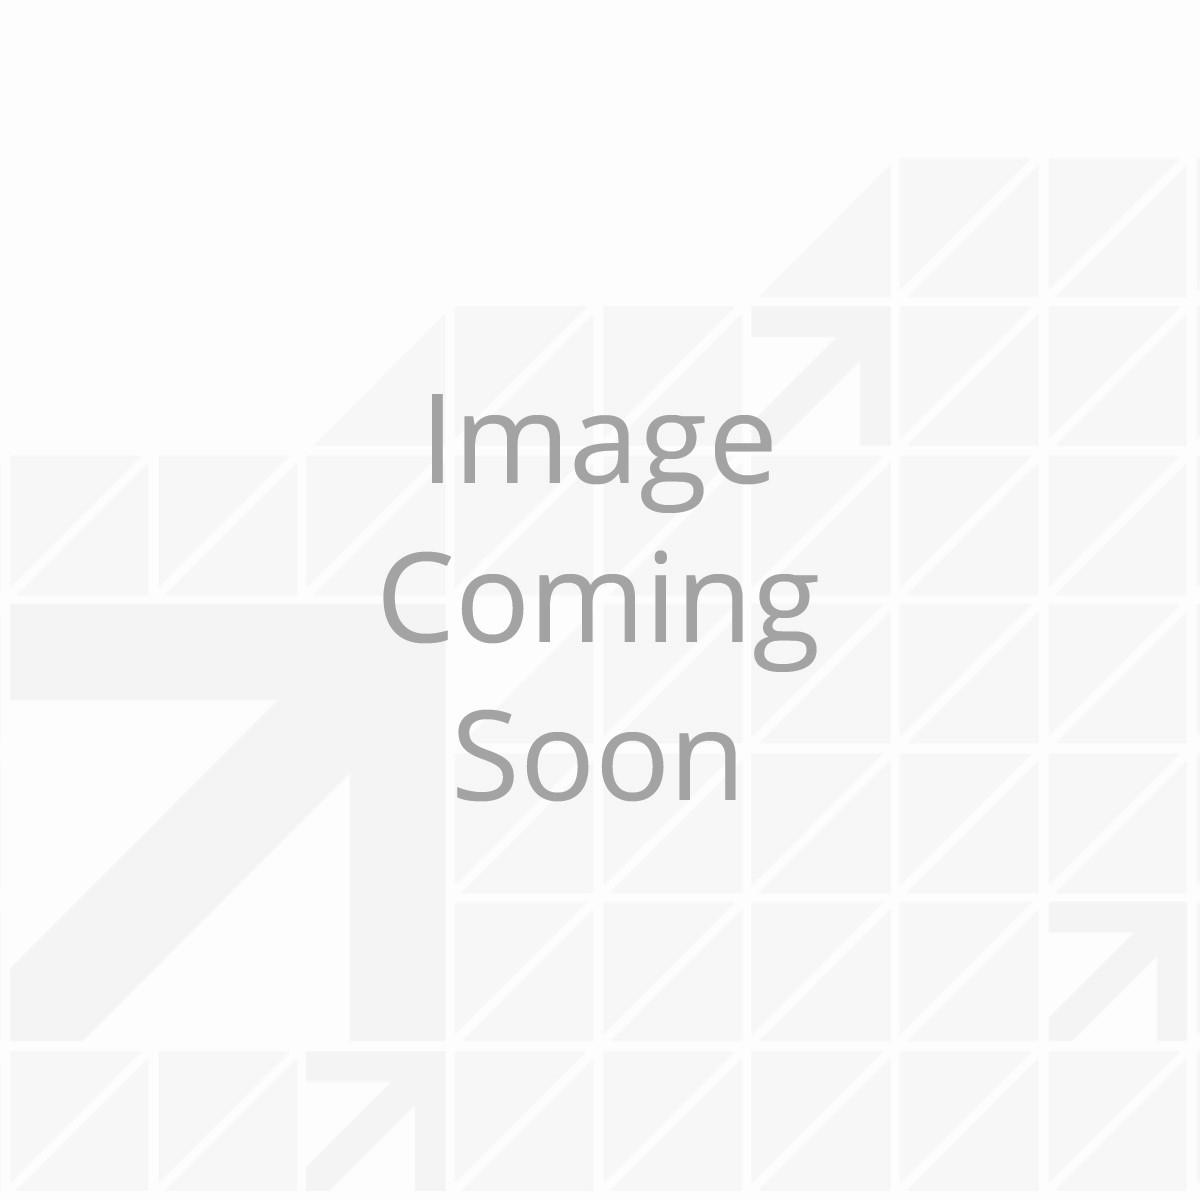 433458_-_8k_hydraulic_jack_-_001